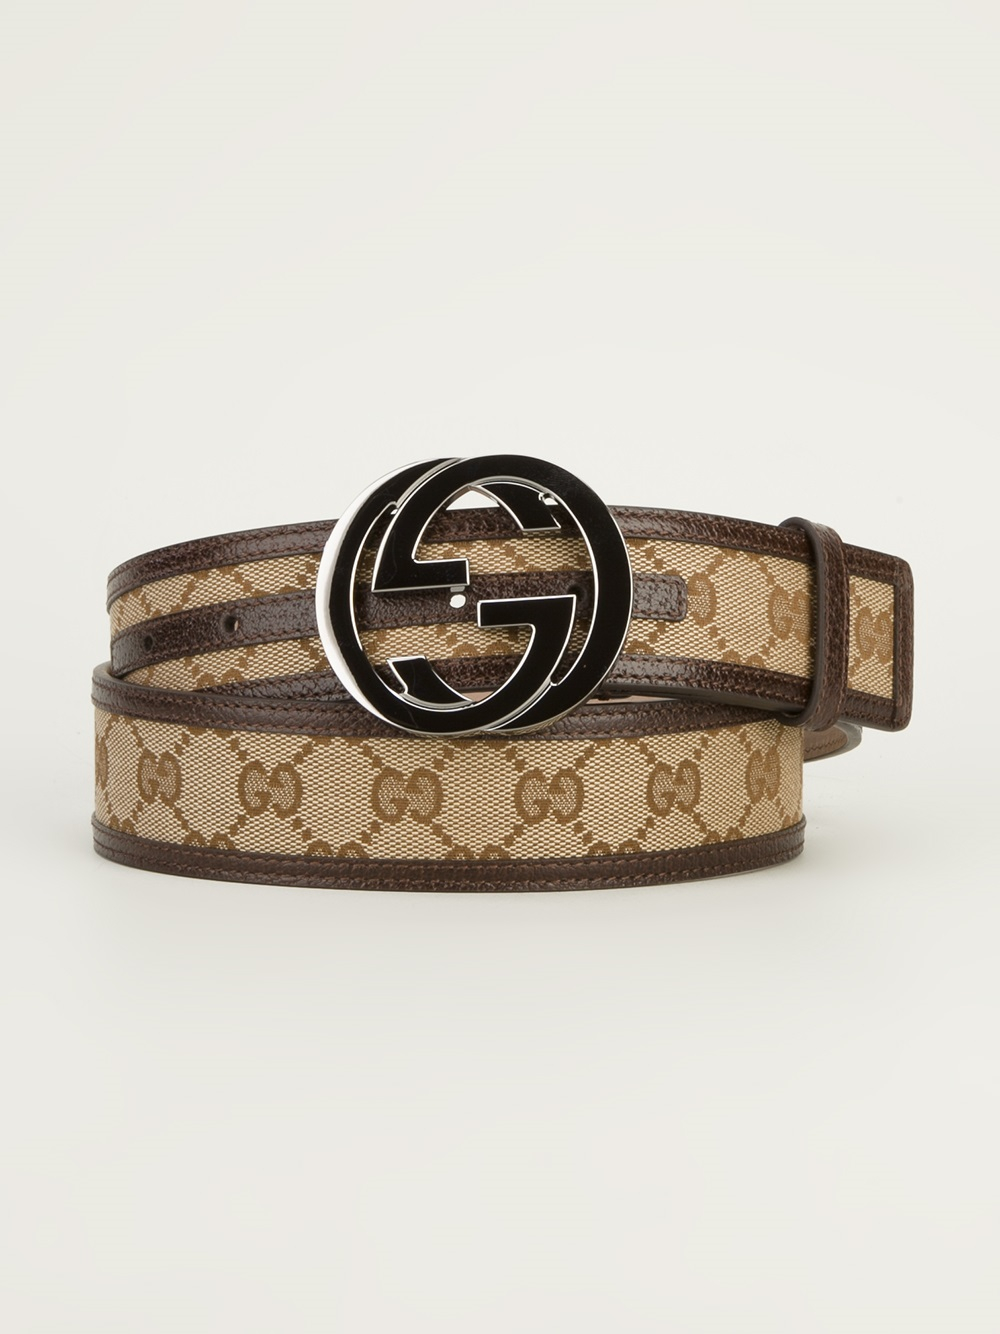 ceda73ae8d0 Lyst - Gucci Logo Belt in Brown for Men